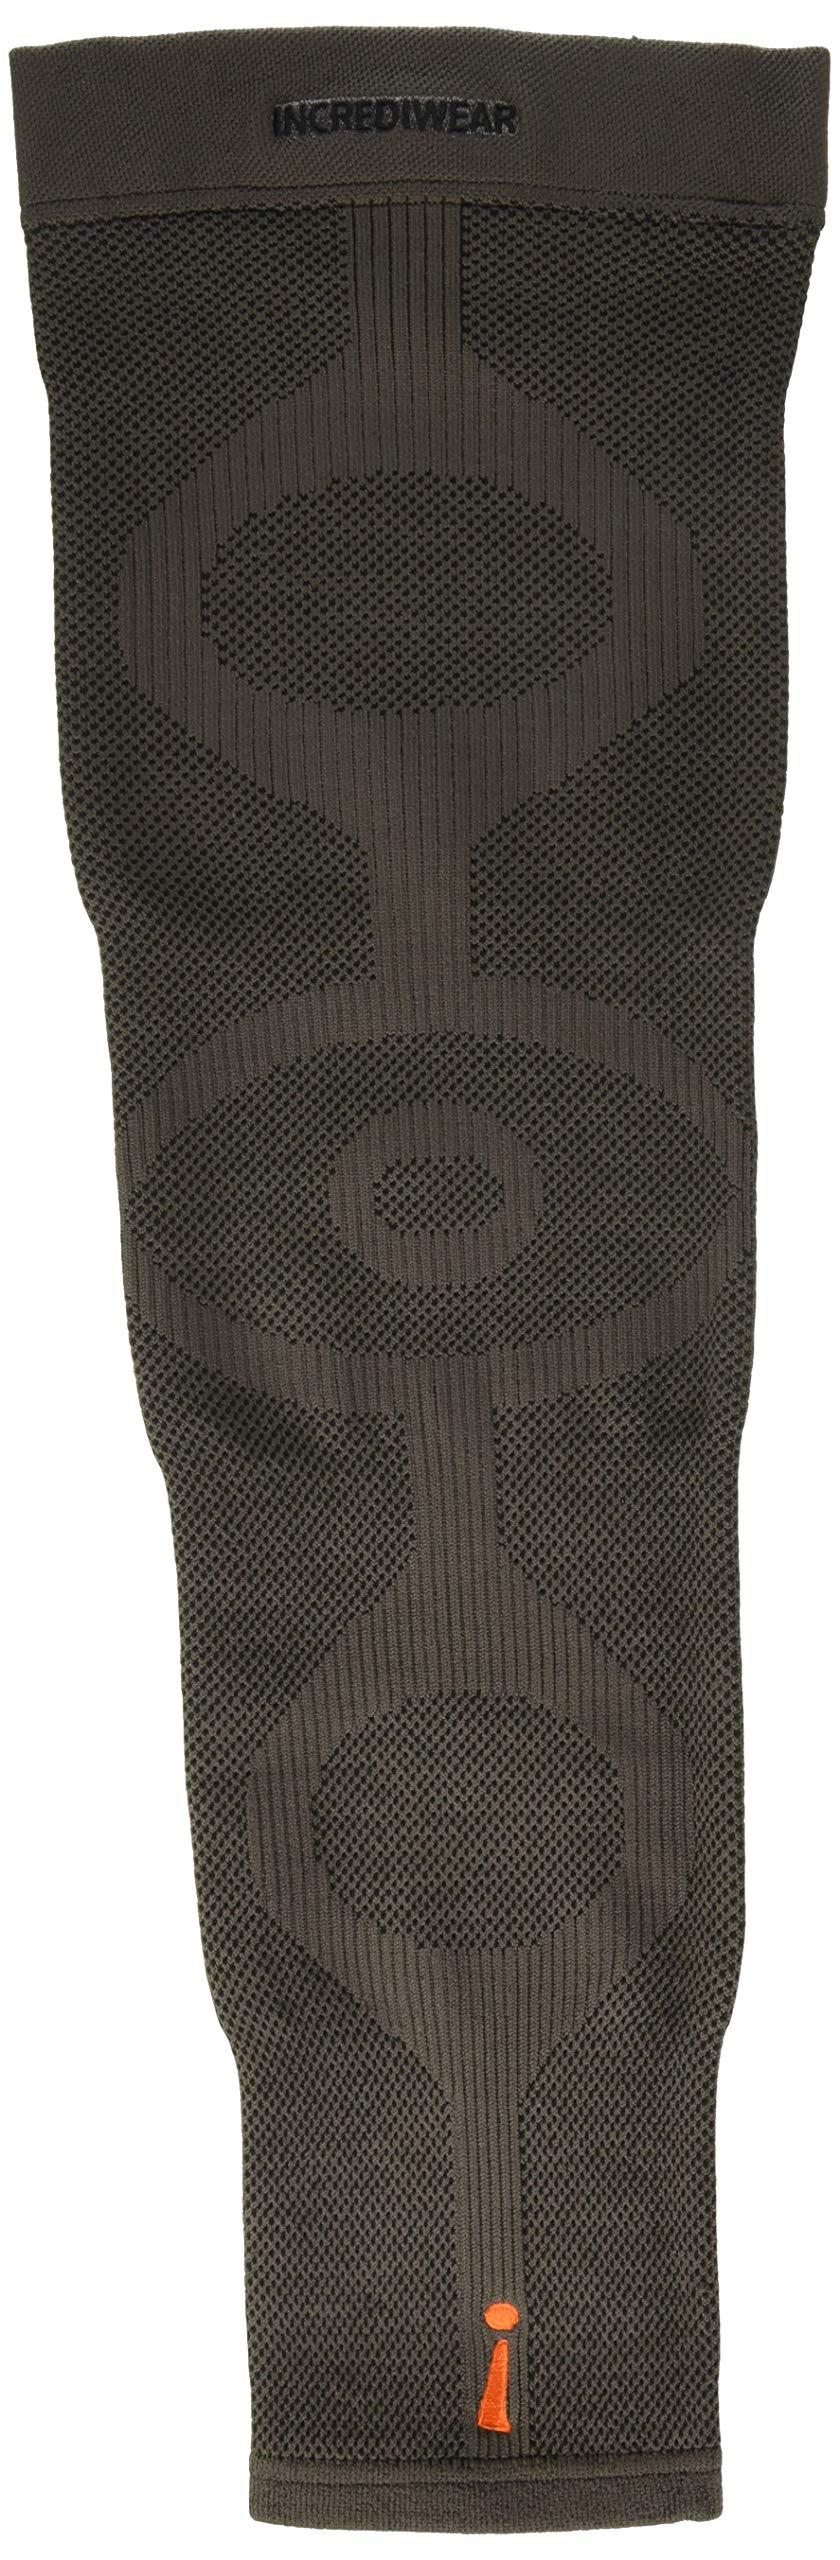 INCREDIWEAR Single Leg Sleeve, Charcoal, Medium, 0.03 Pound